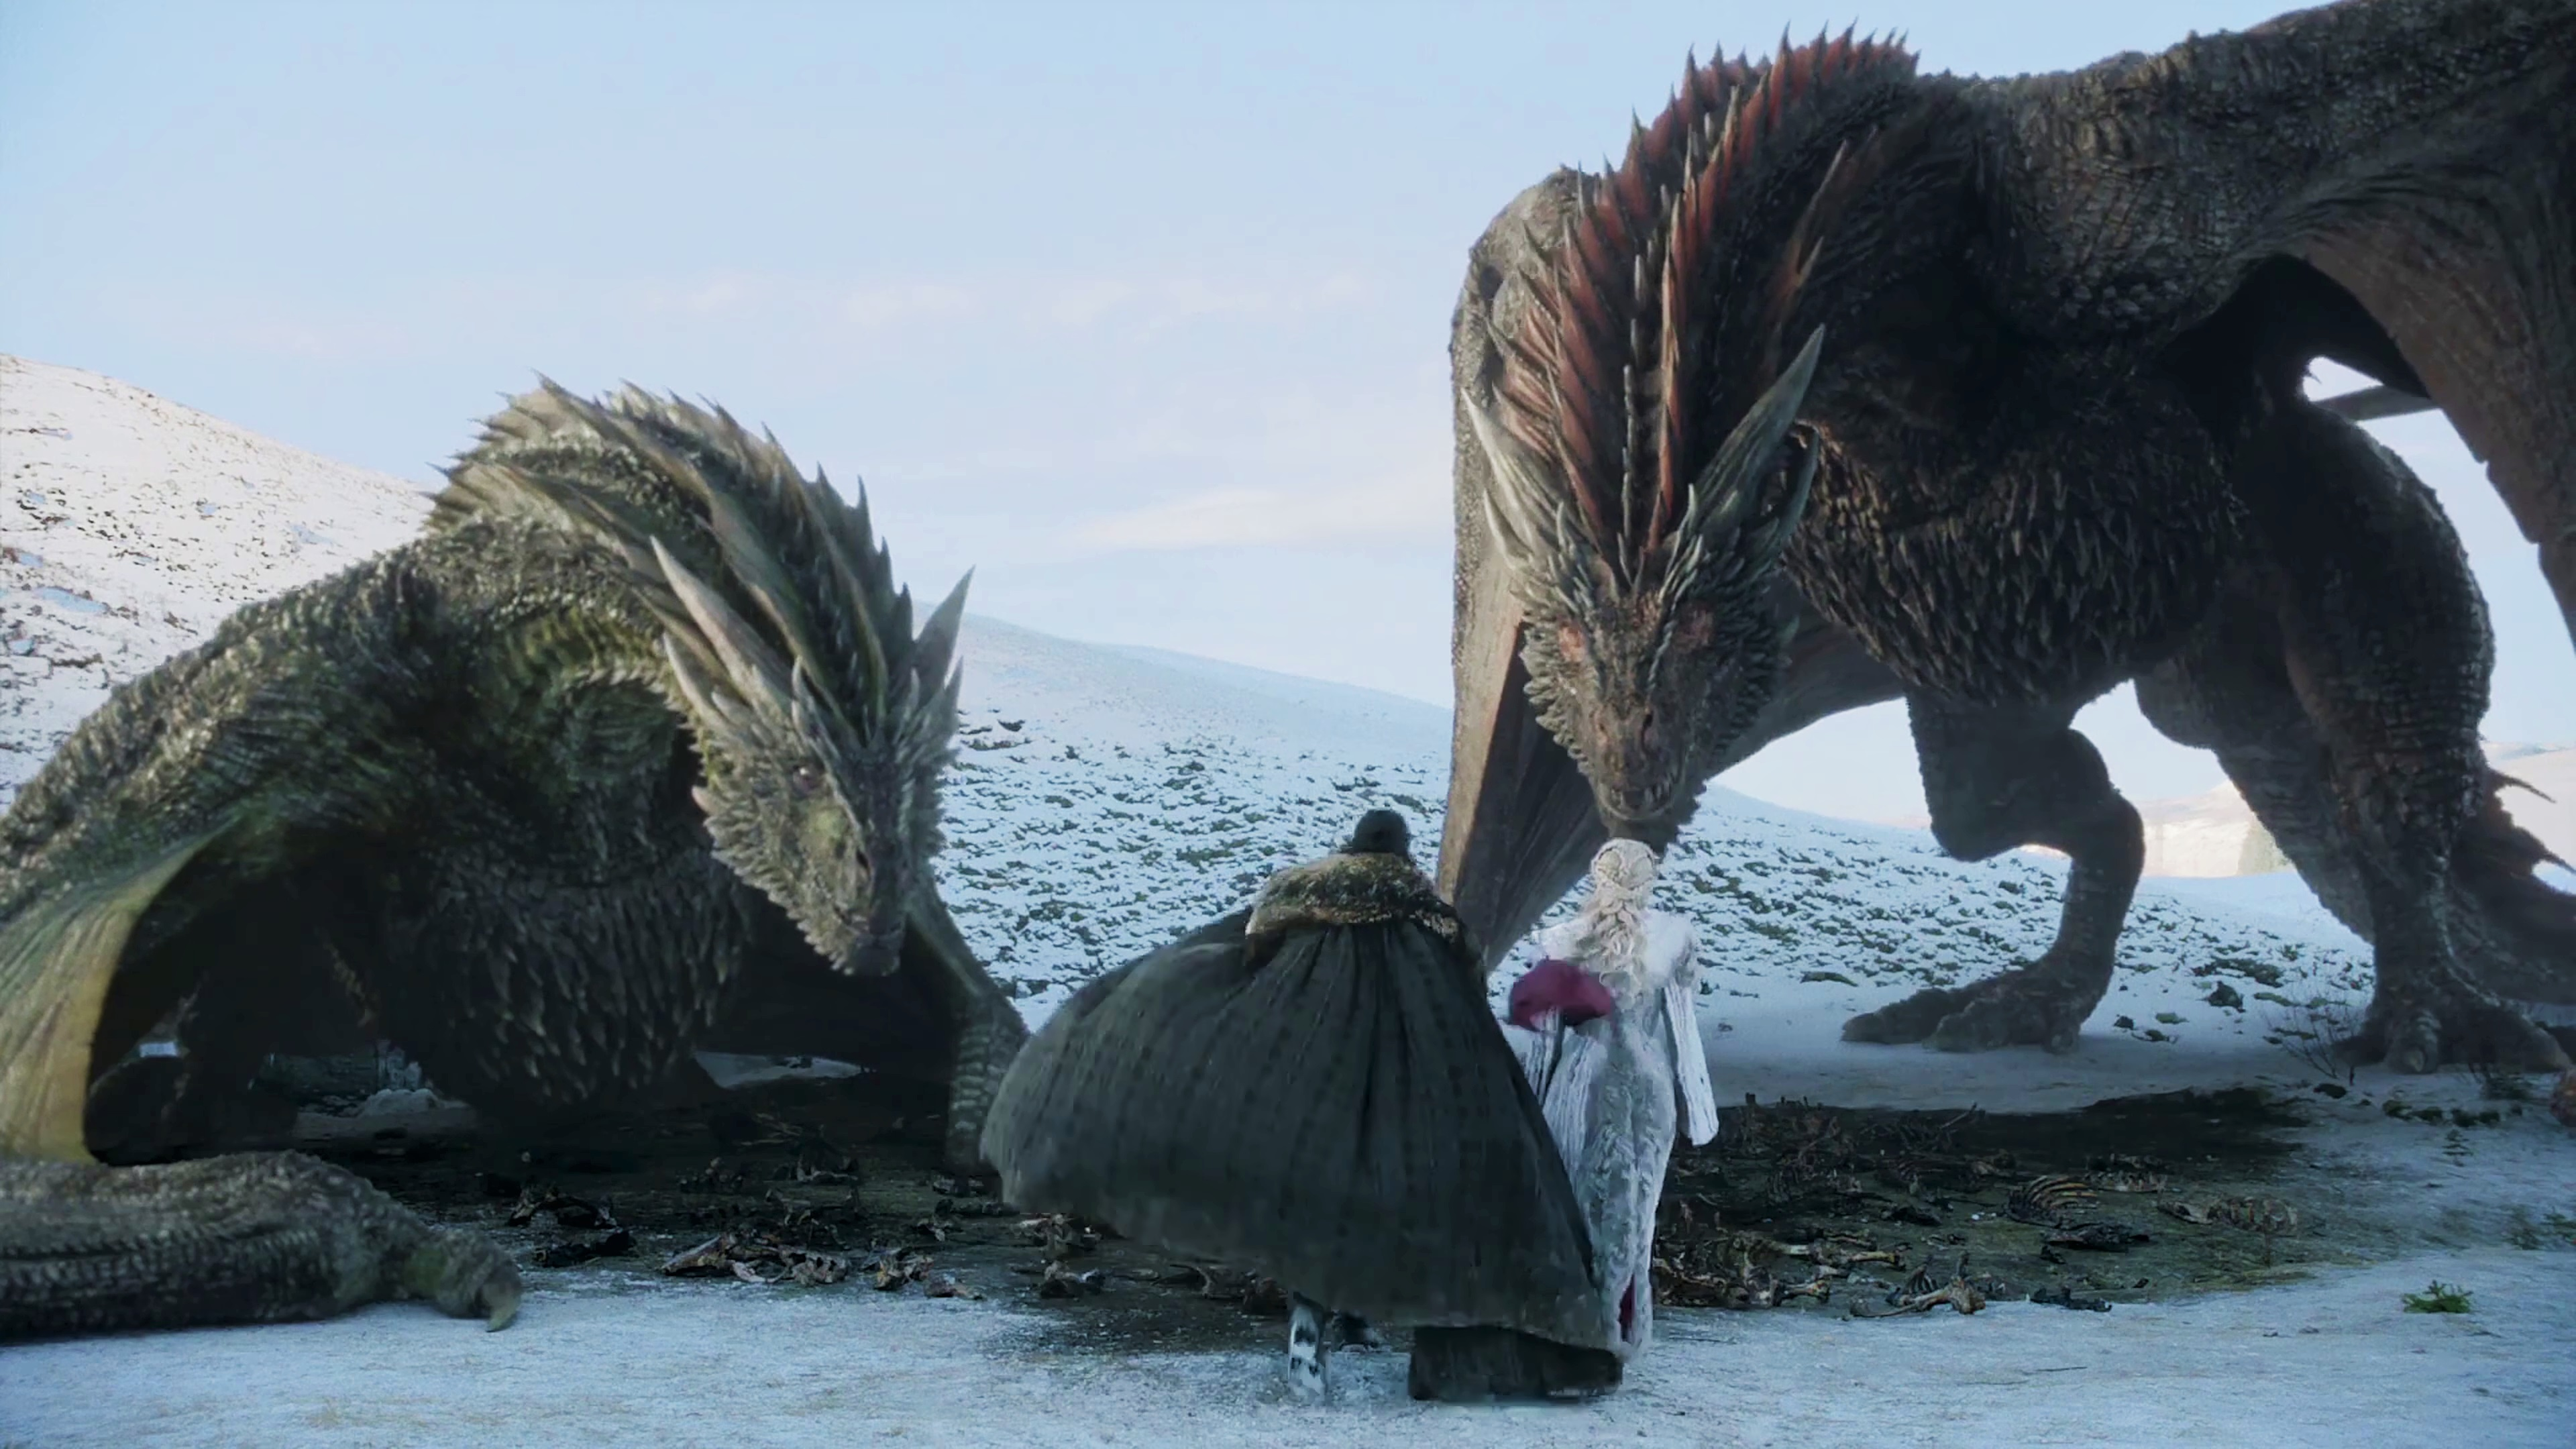 39. Season 8 Trailer Jon Snow Daenerys Targaryen Drogon Viserion 2